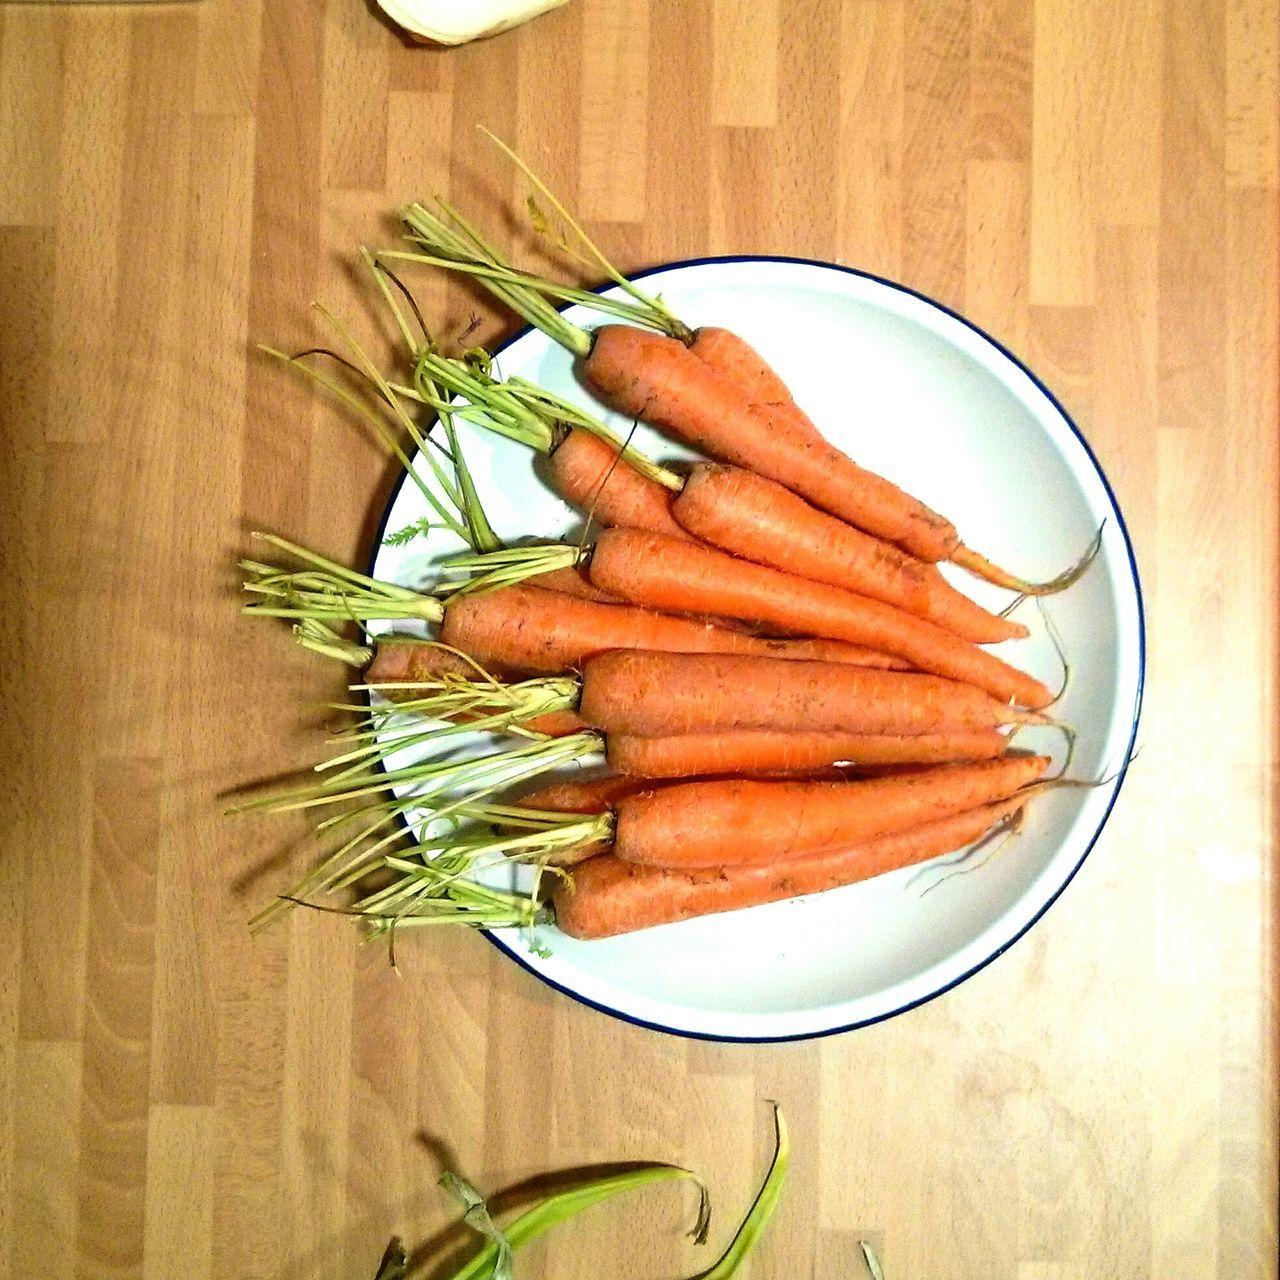 Carrots Zanahorias Orange Naranja